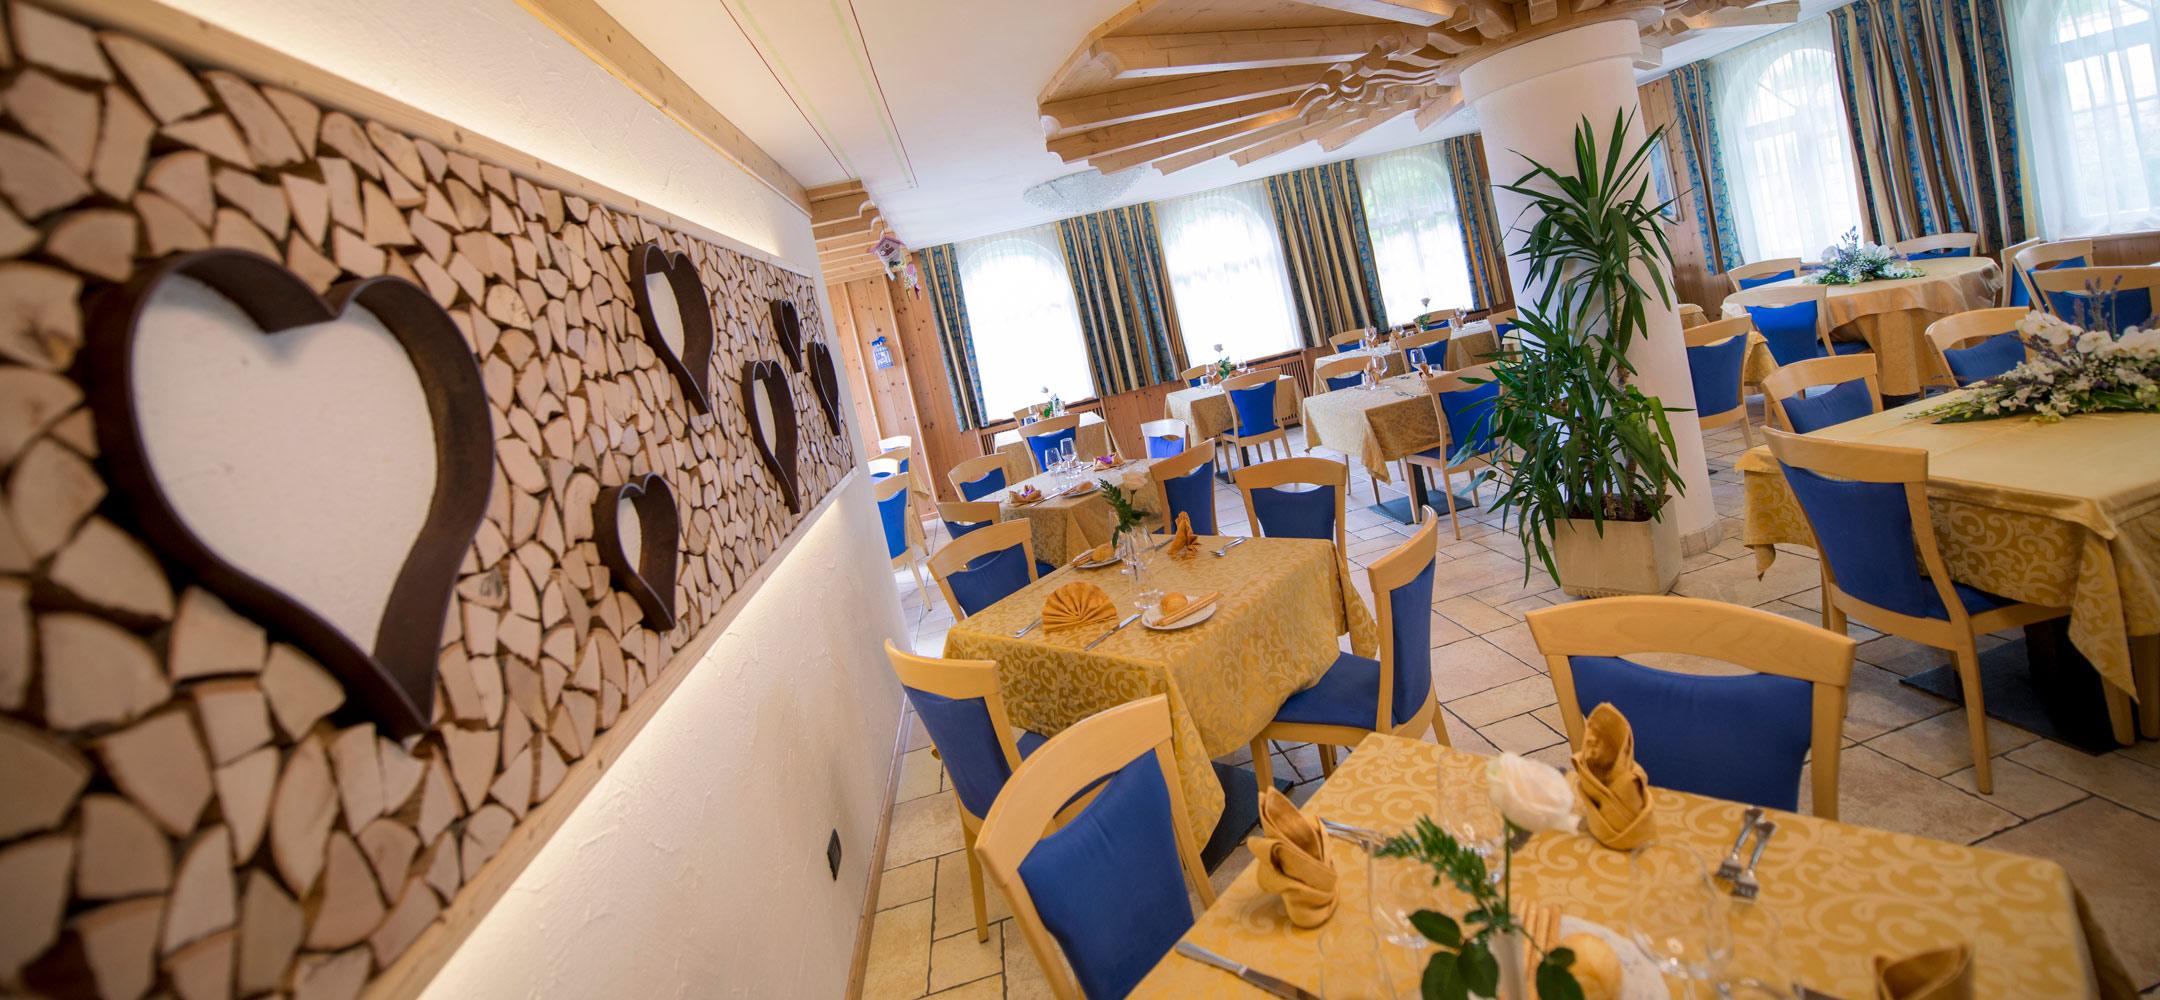 Hotel_miravalle_cucina01